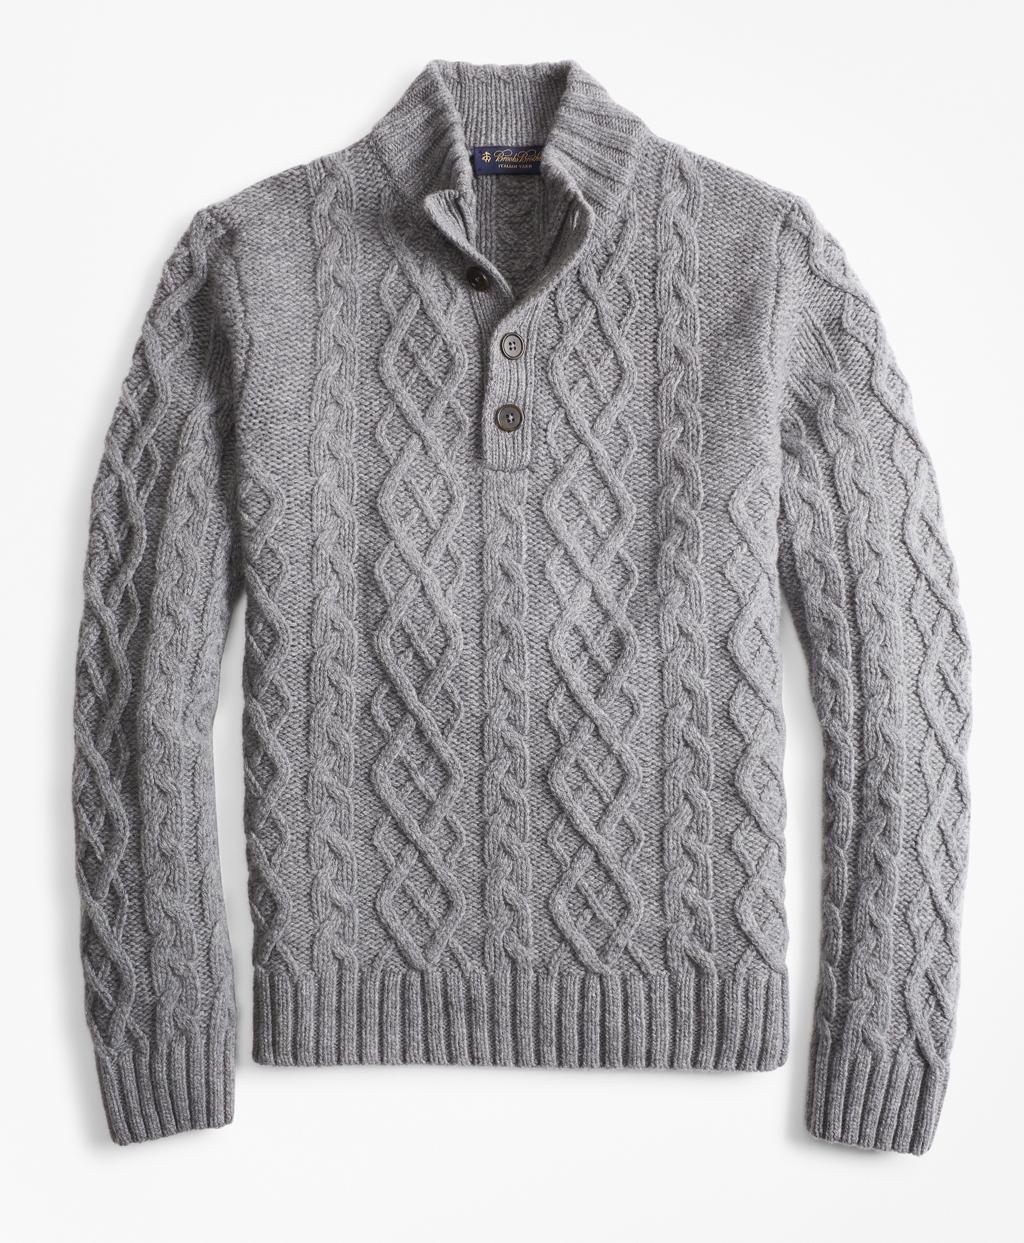 Men's Vintage Sweaters – 1920s to 1960s Retro Jumpers Brooks Brothers Mens Cable Mockneck Sweater $348.00 AT vintagedancer.com